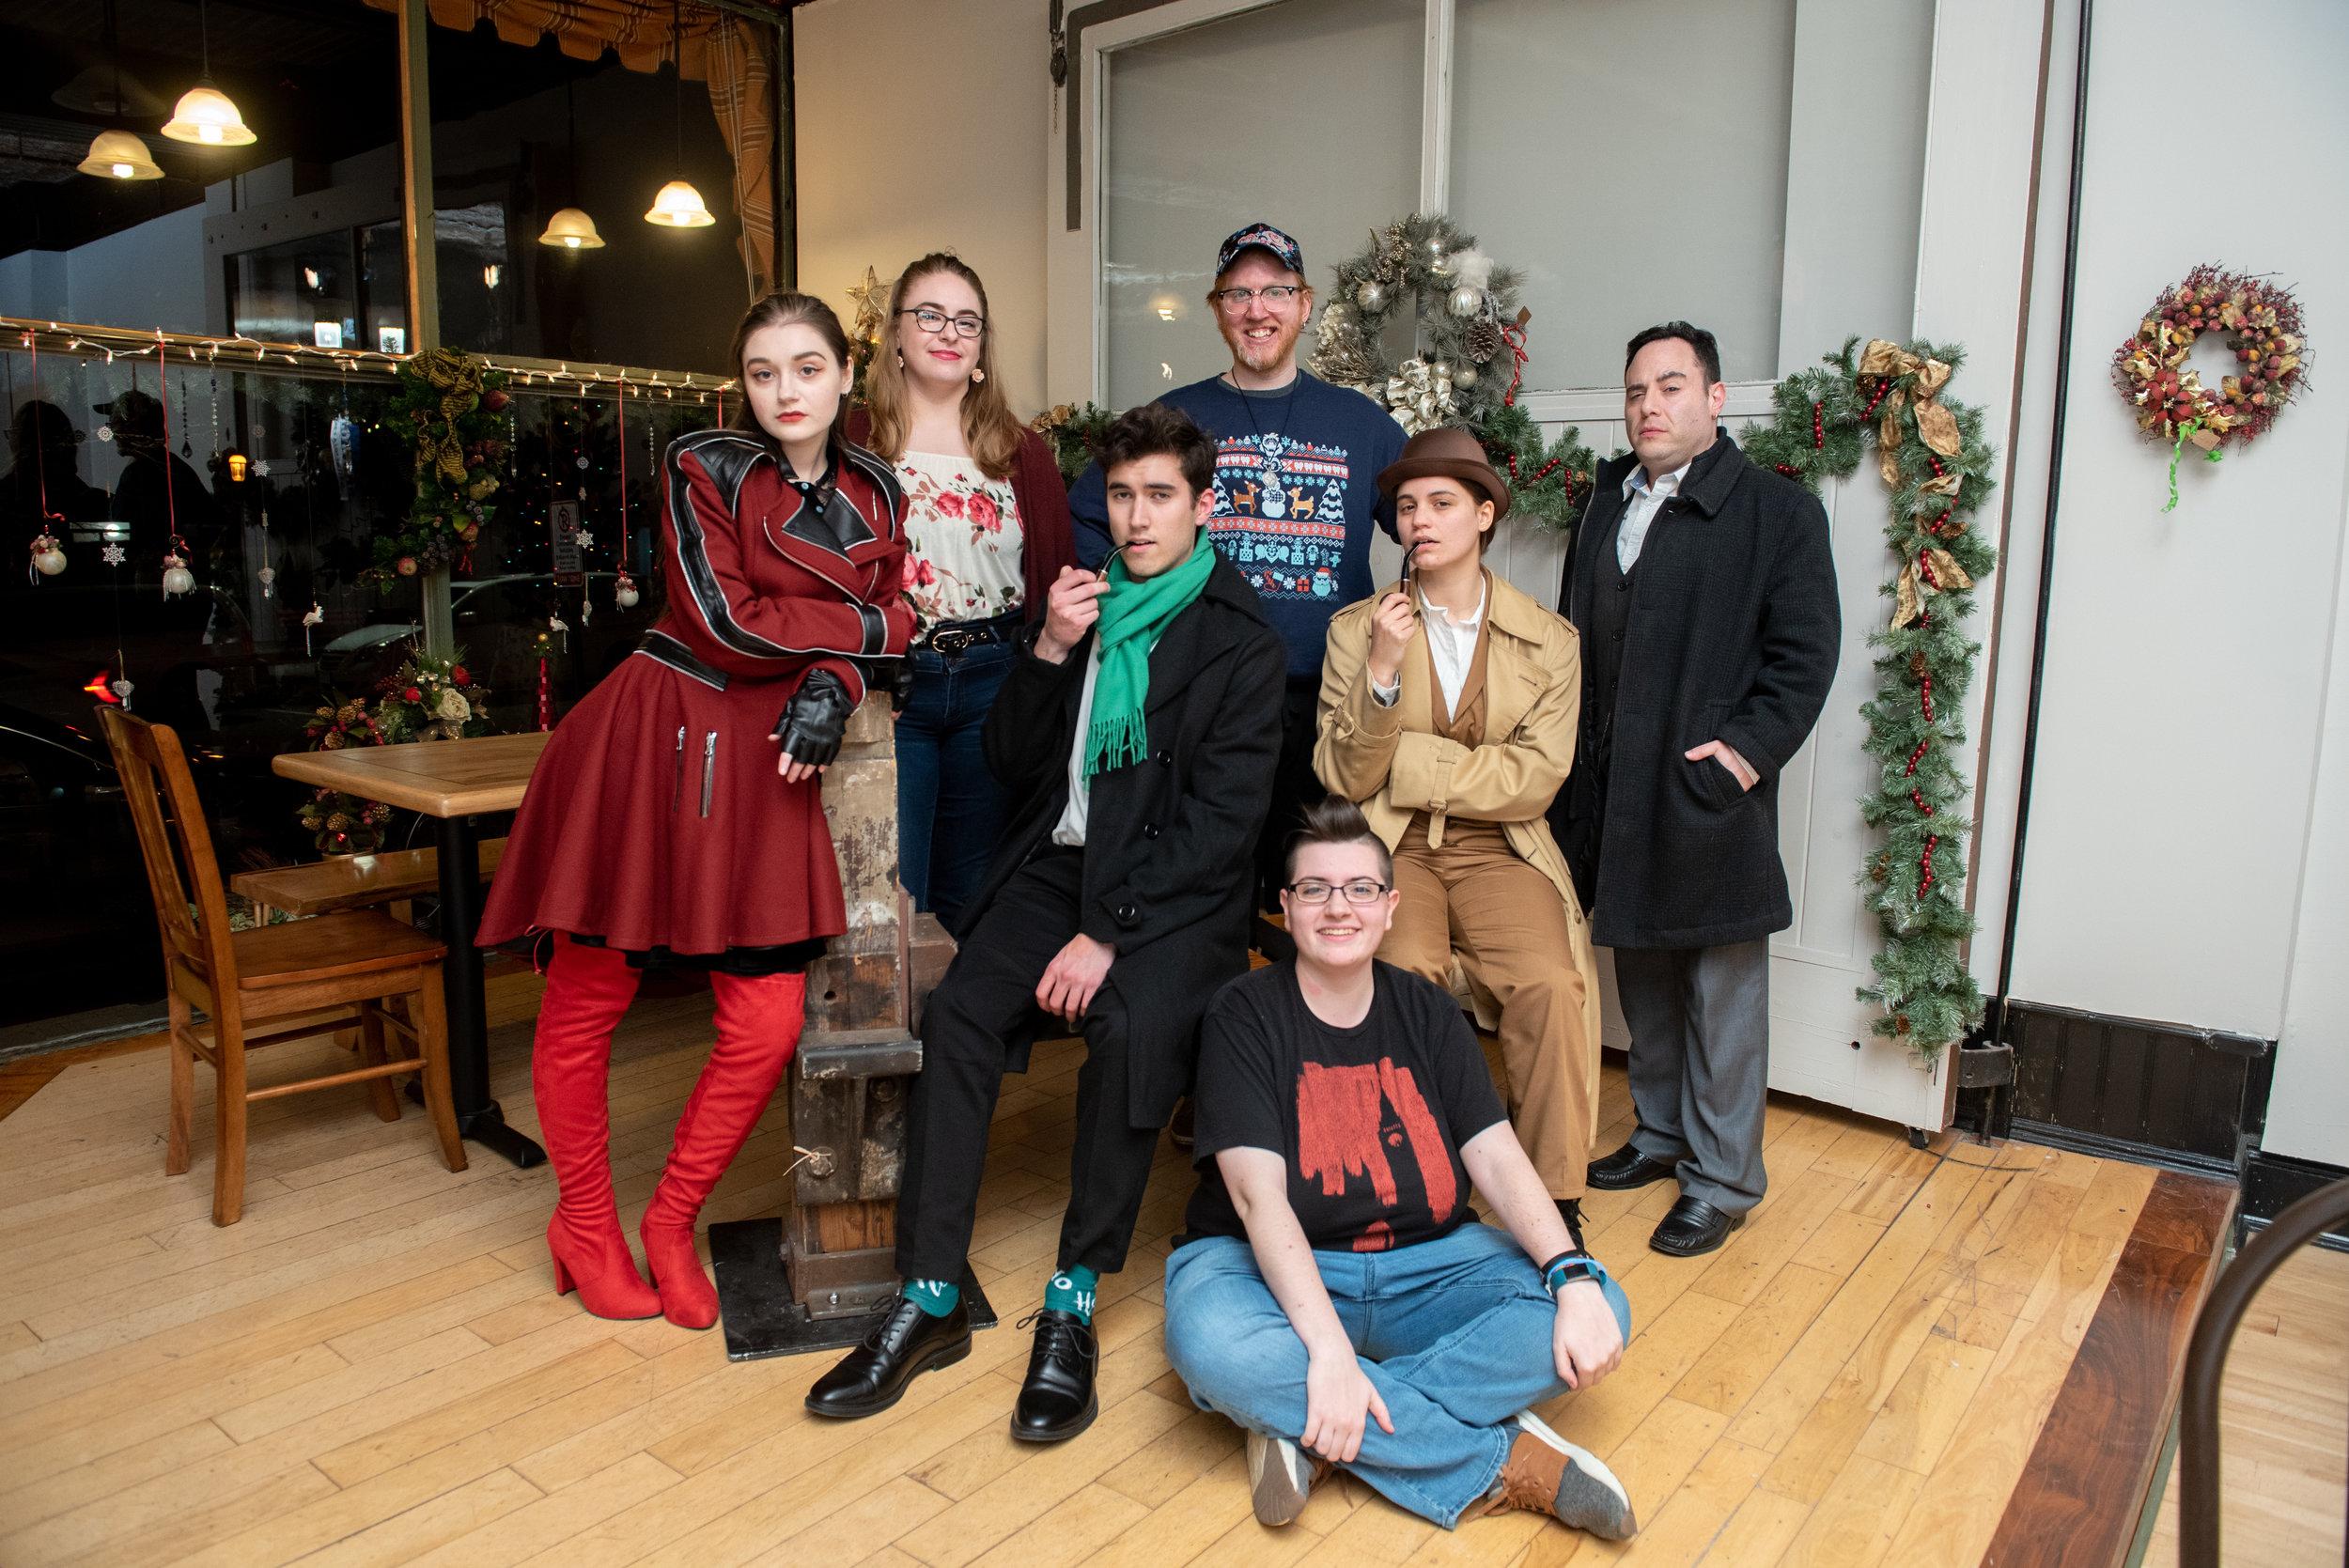 Sherlock Holmes: The Final Problem - December 6th-9th 2018